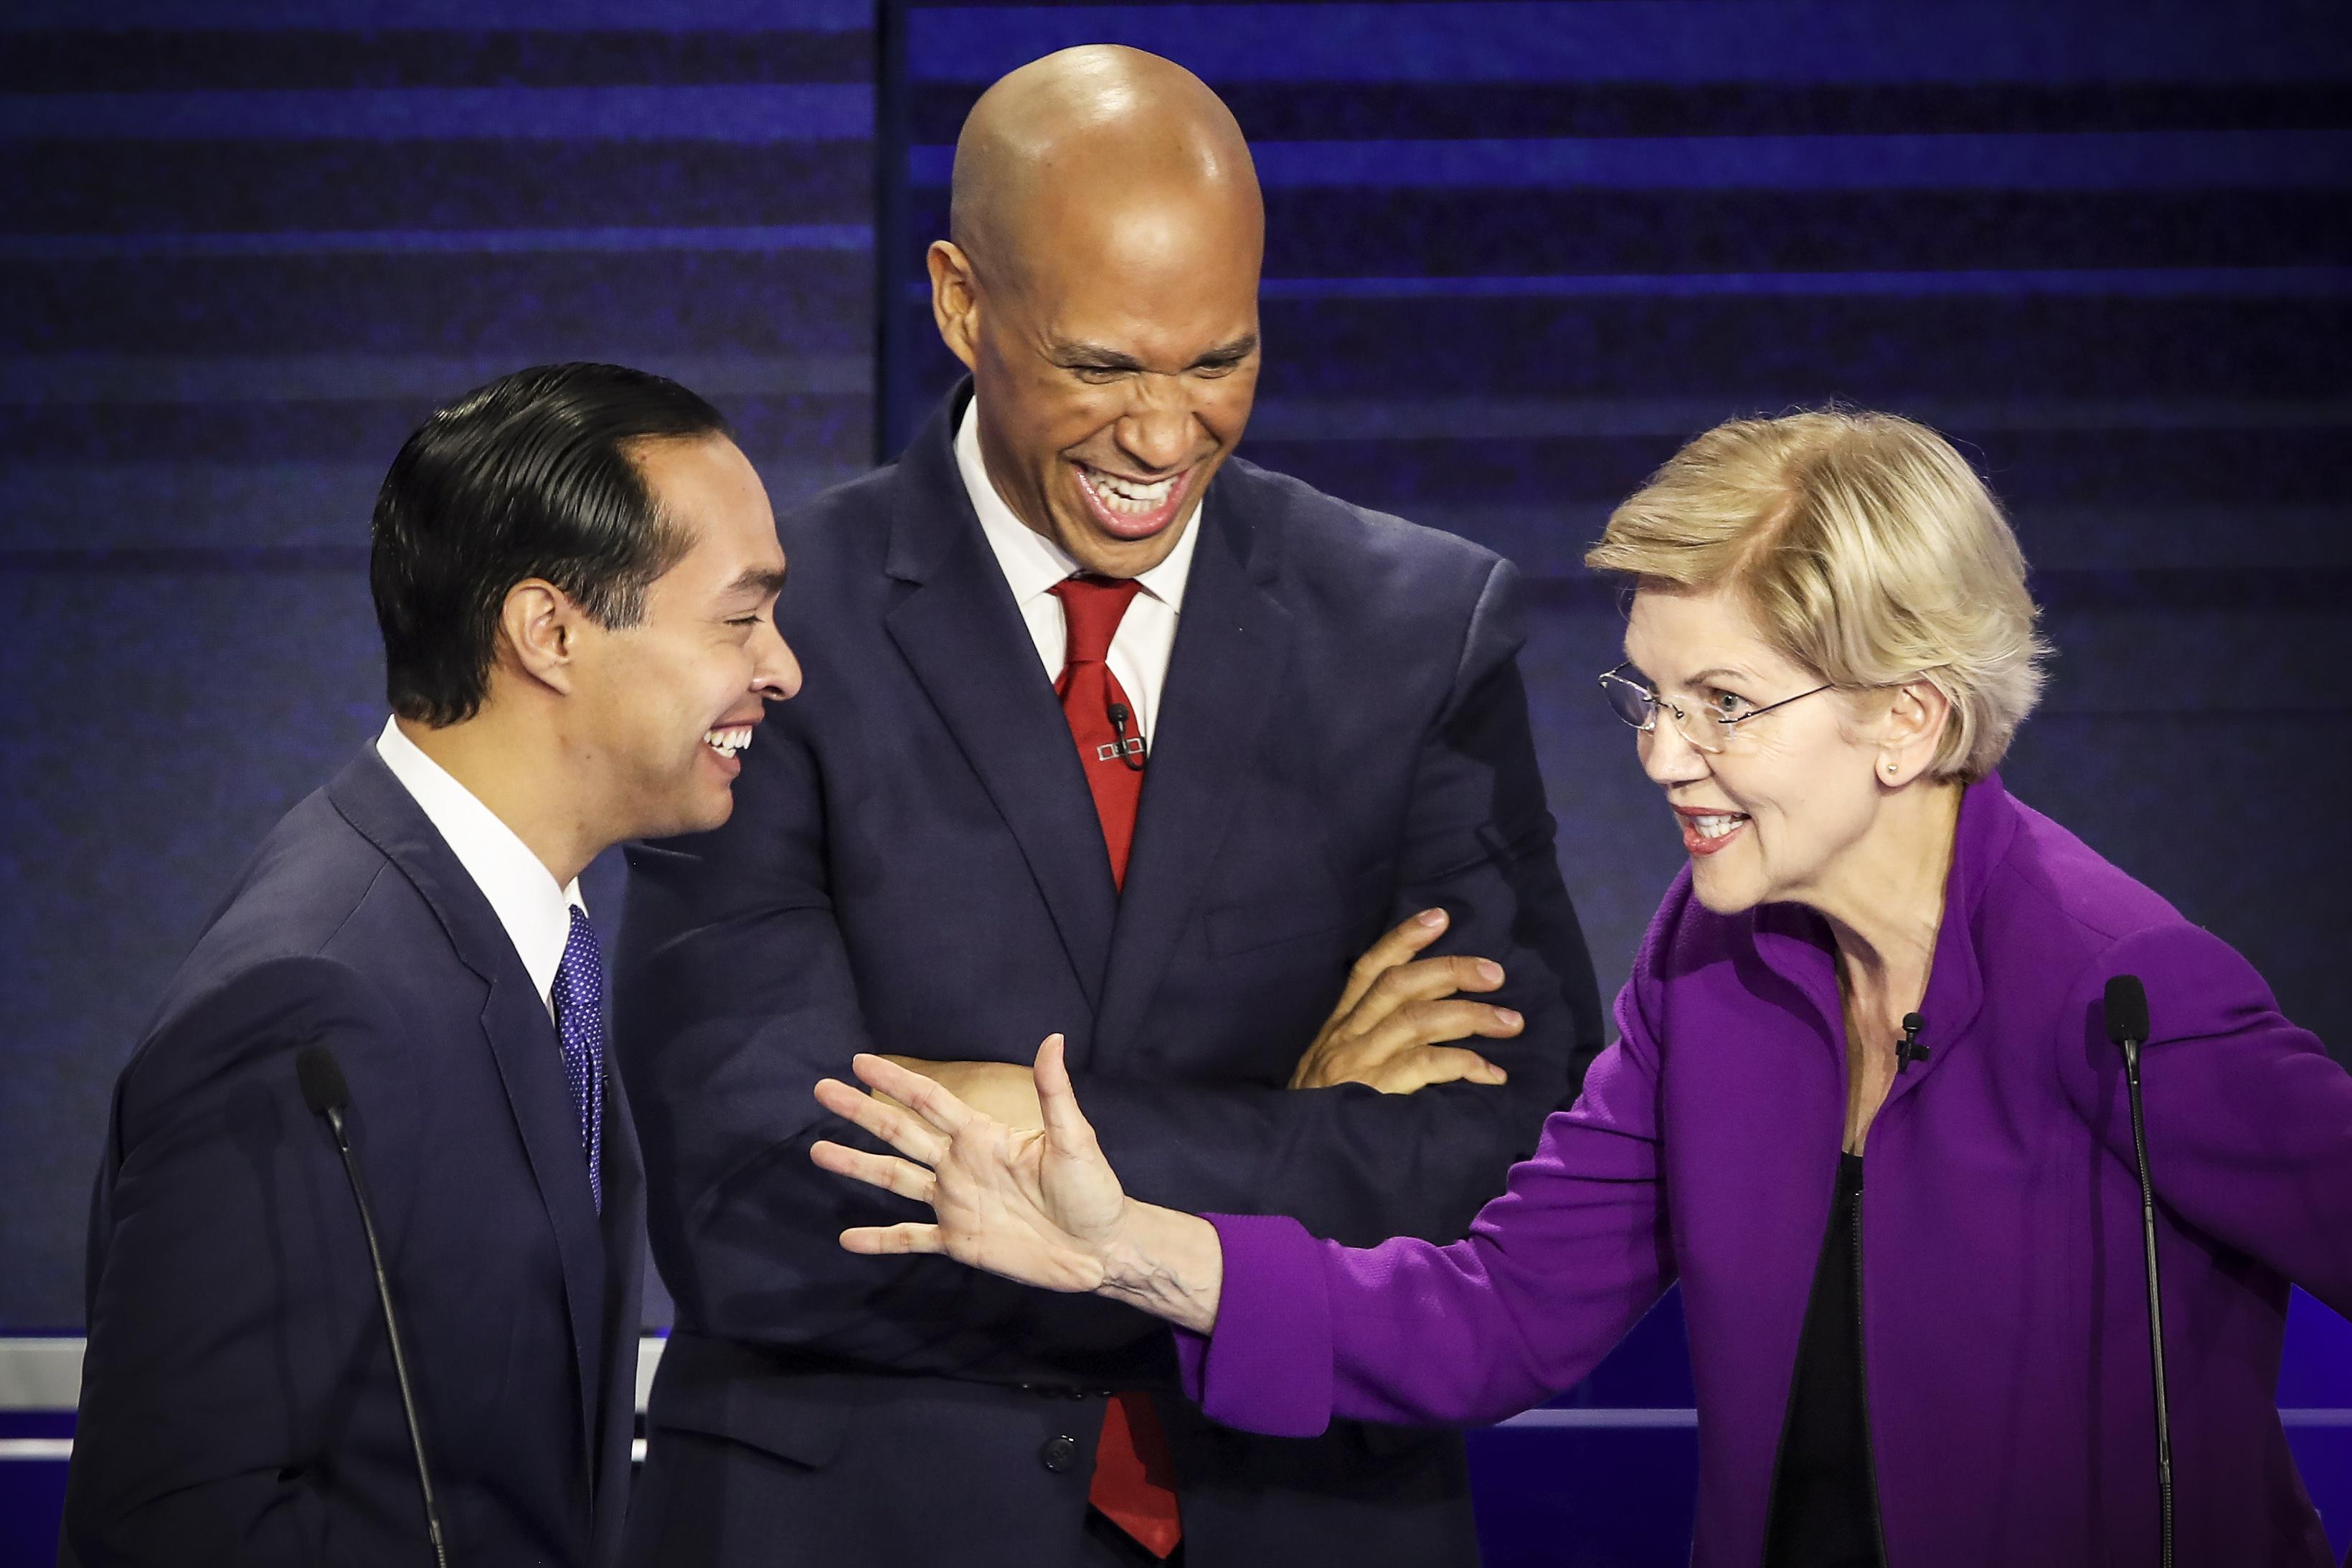 Former housing secretary Julian Castro, Sen. Cory Booker (D-NJ) and Sen. Elizabeth Warren (D-MA) interact during the first night of the Democratic presidential debate on June 26, 2019 in Miami, Florida.